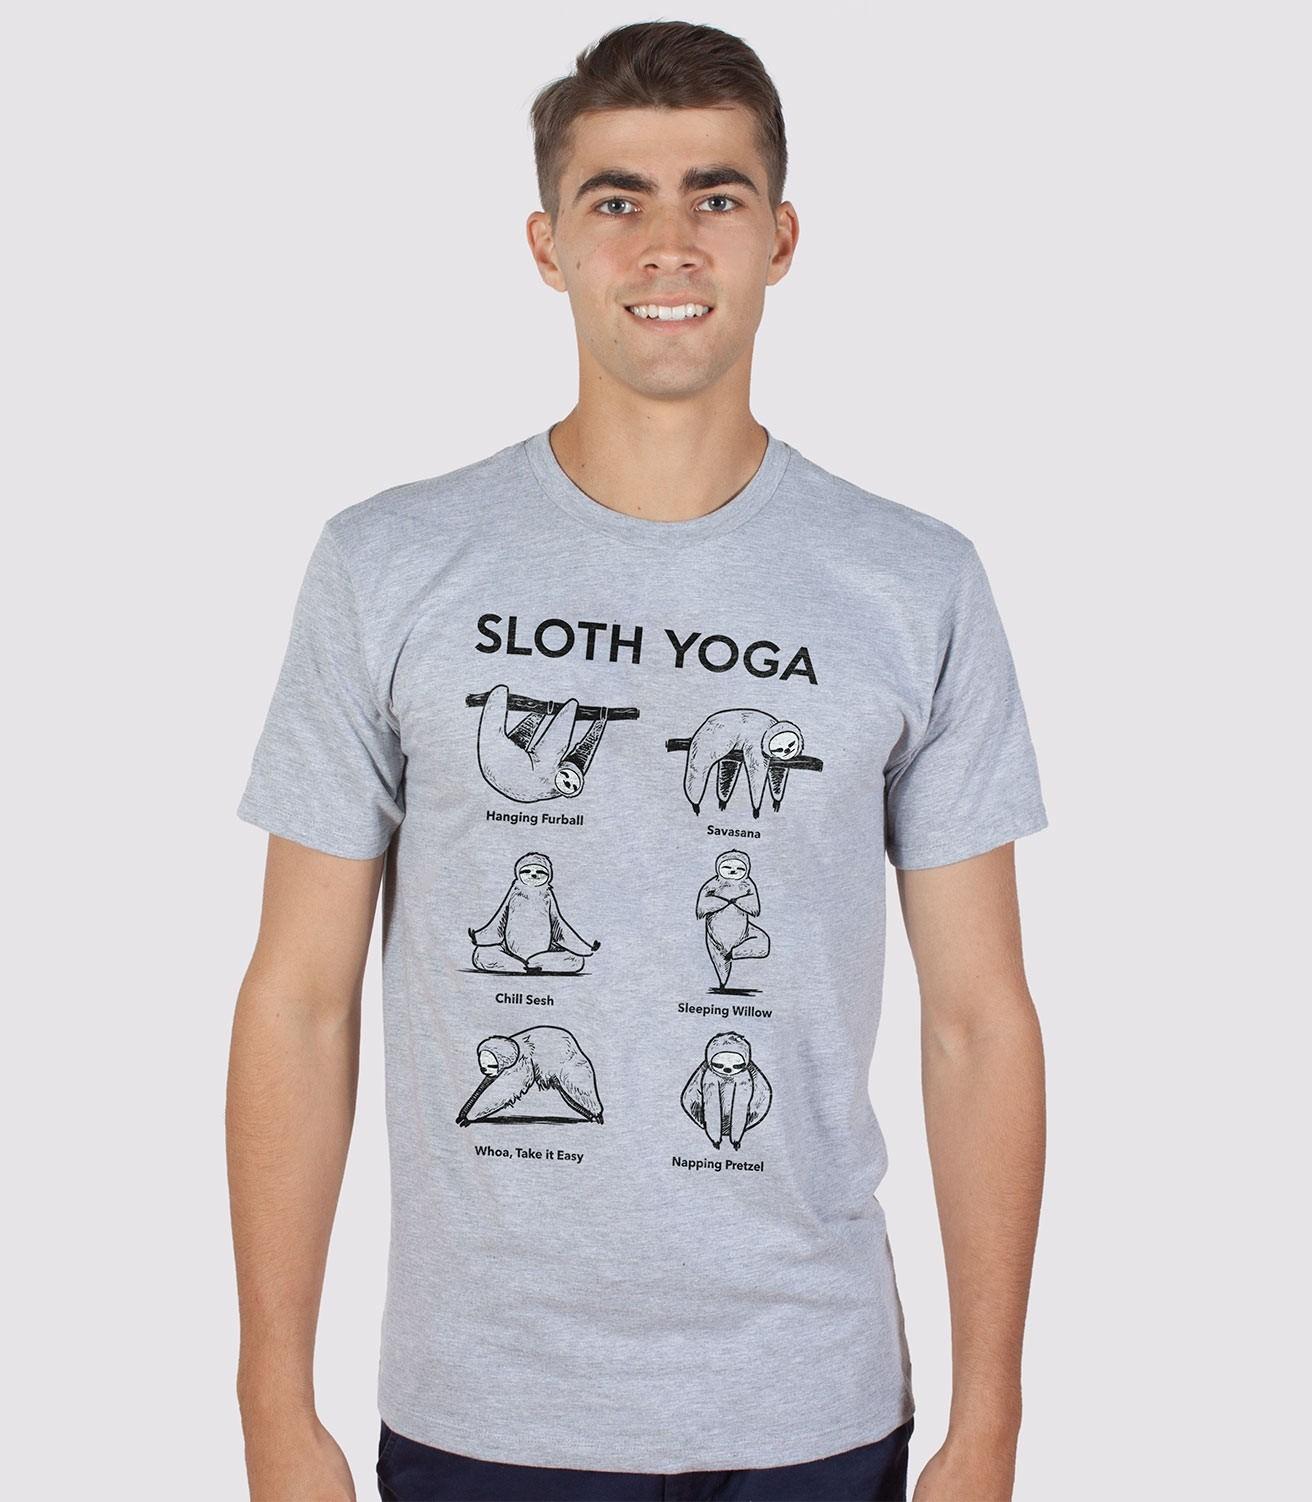 Sloth Yoga Funny Men s Cotton Poly T-Shirt  6d130629fd4